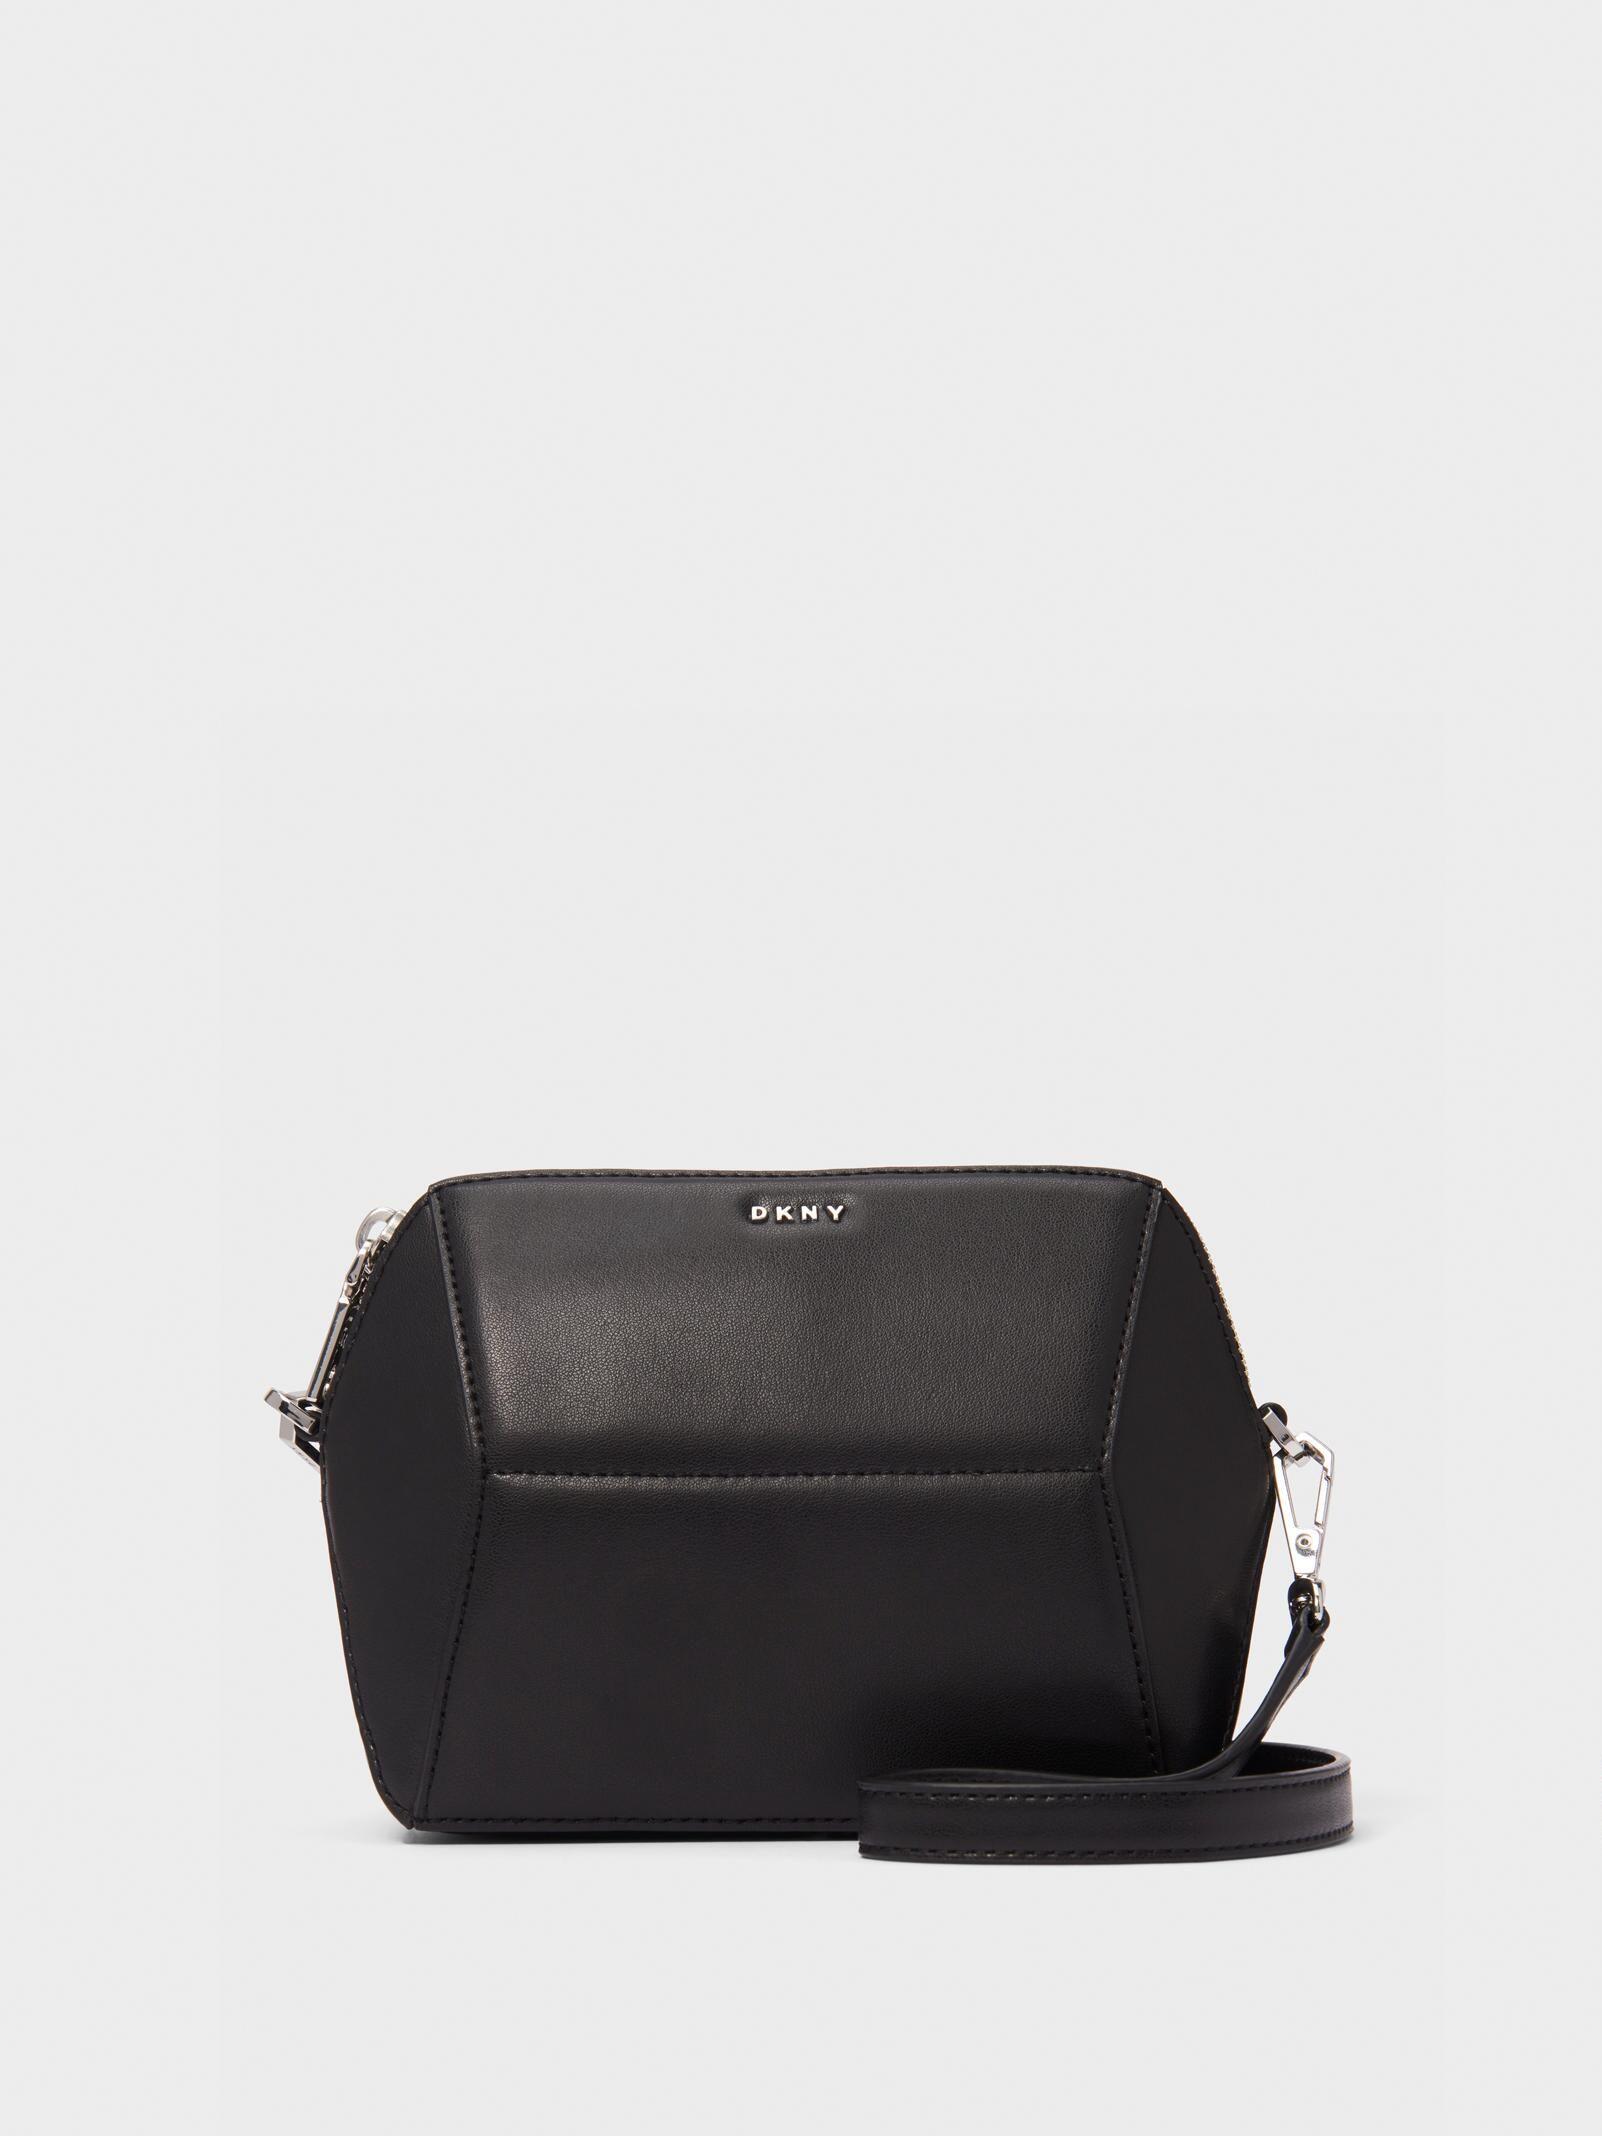 731775024 WEST-SIDER LEATHER CROSSBODY- DKNY Leather Crossbody, Crossbody Bag, Dkny  Handbags,